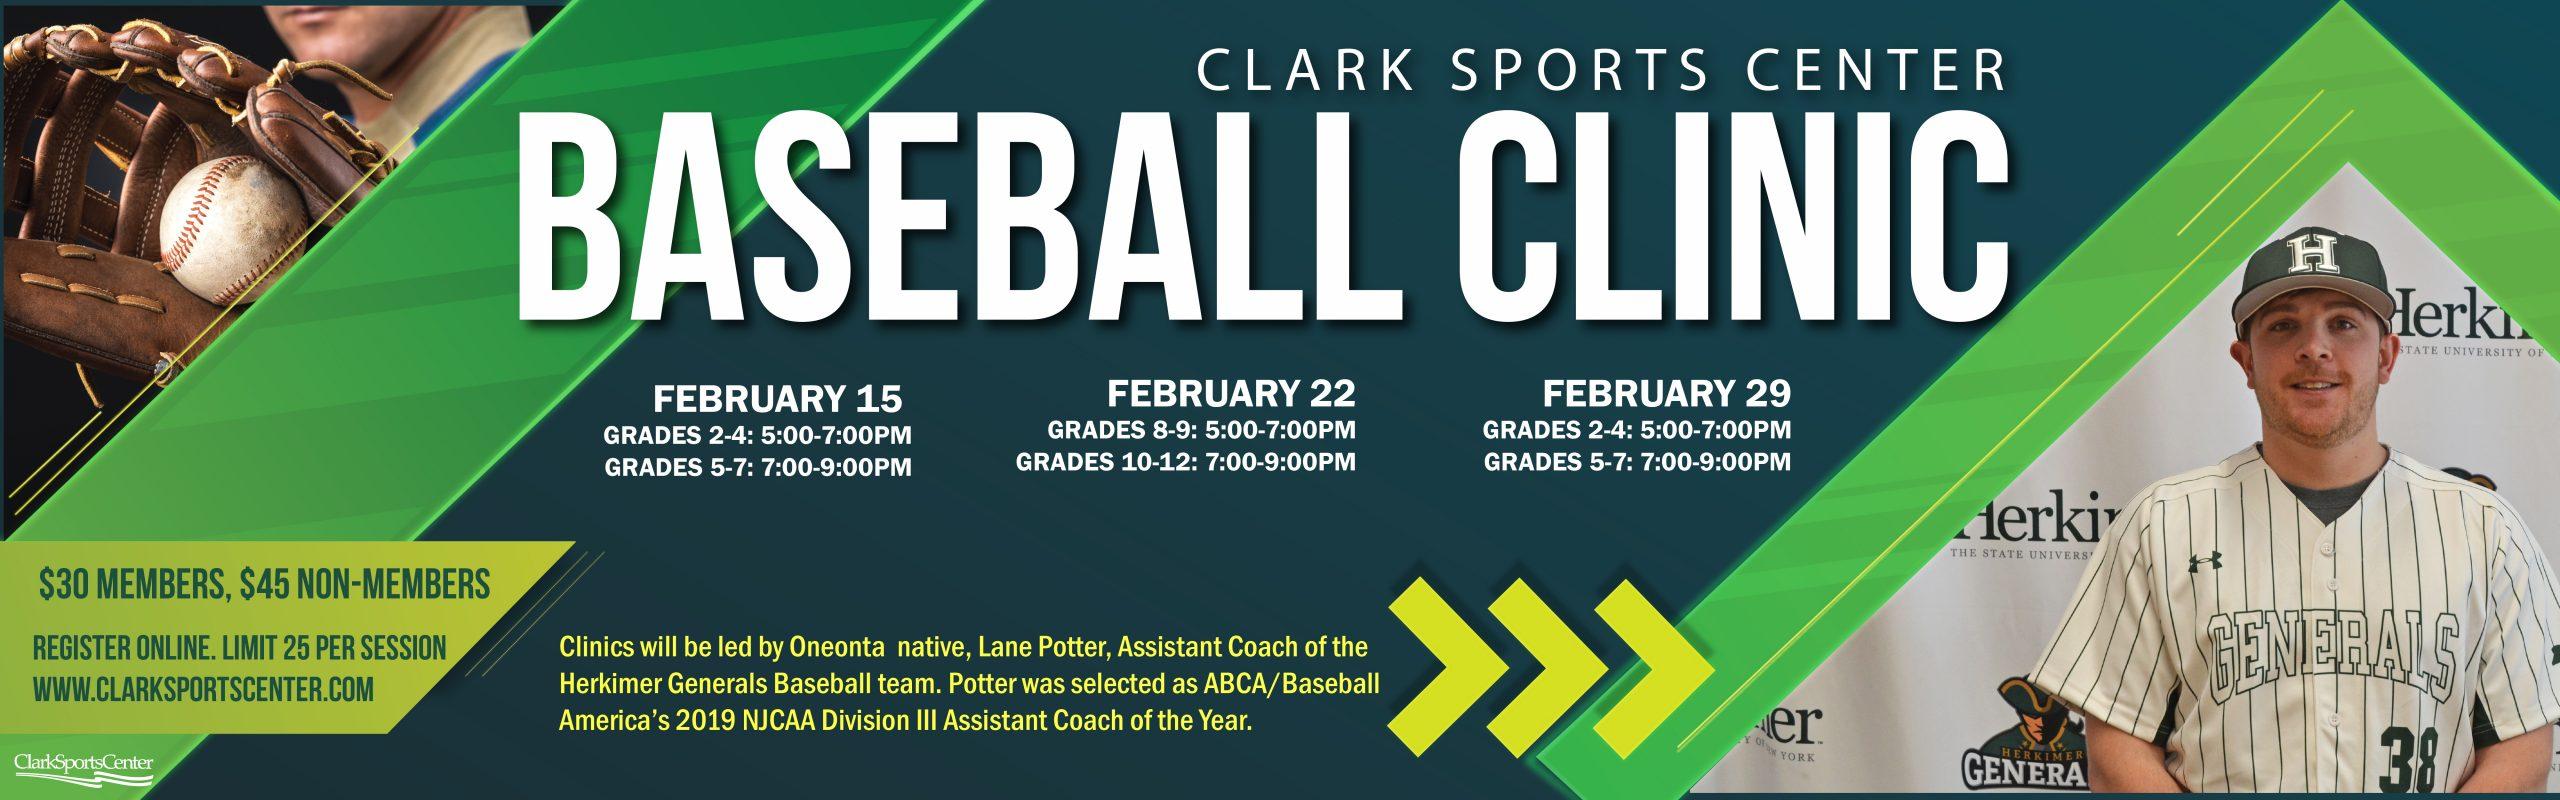 New! February Baseball Clinics